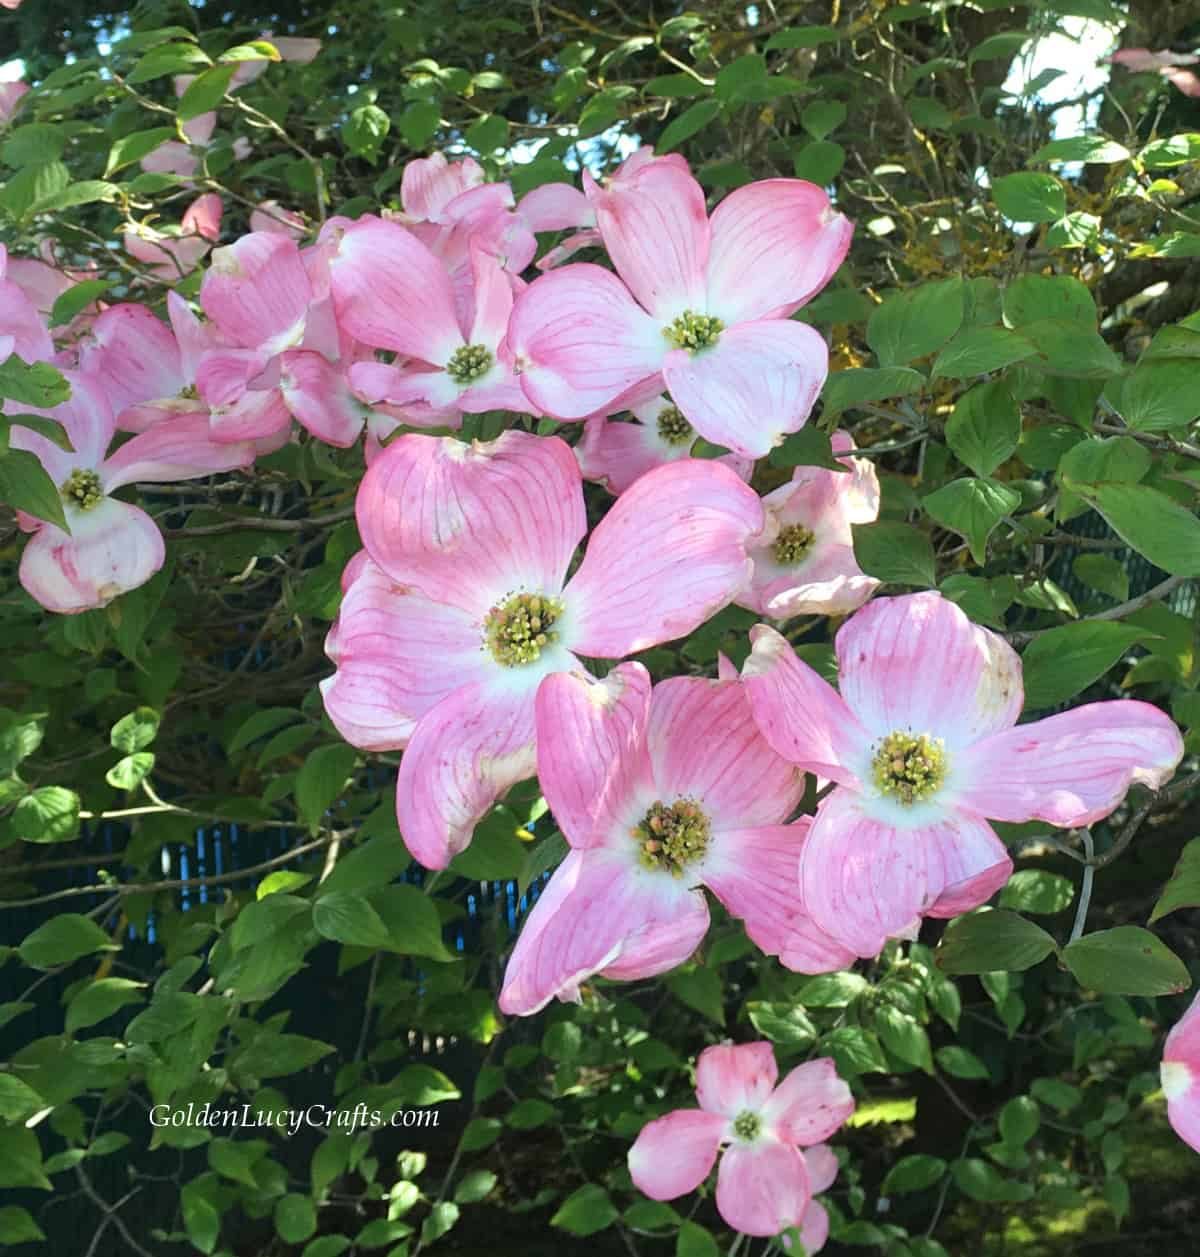 Pink dogwood flowers.